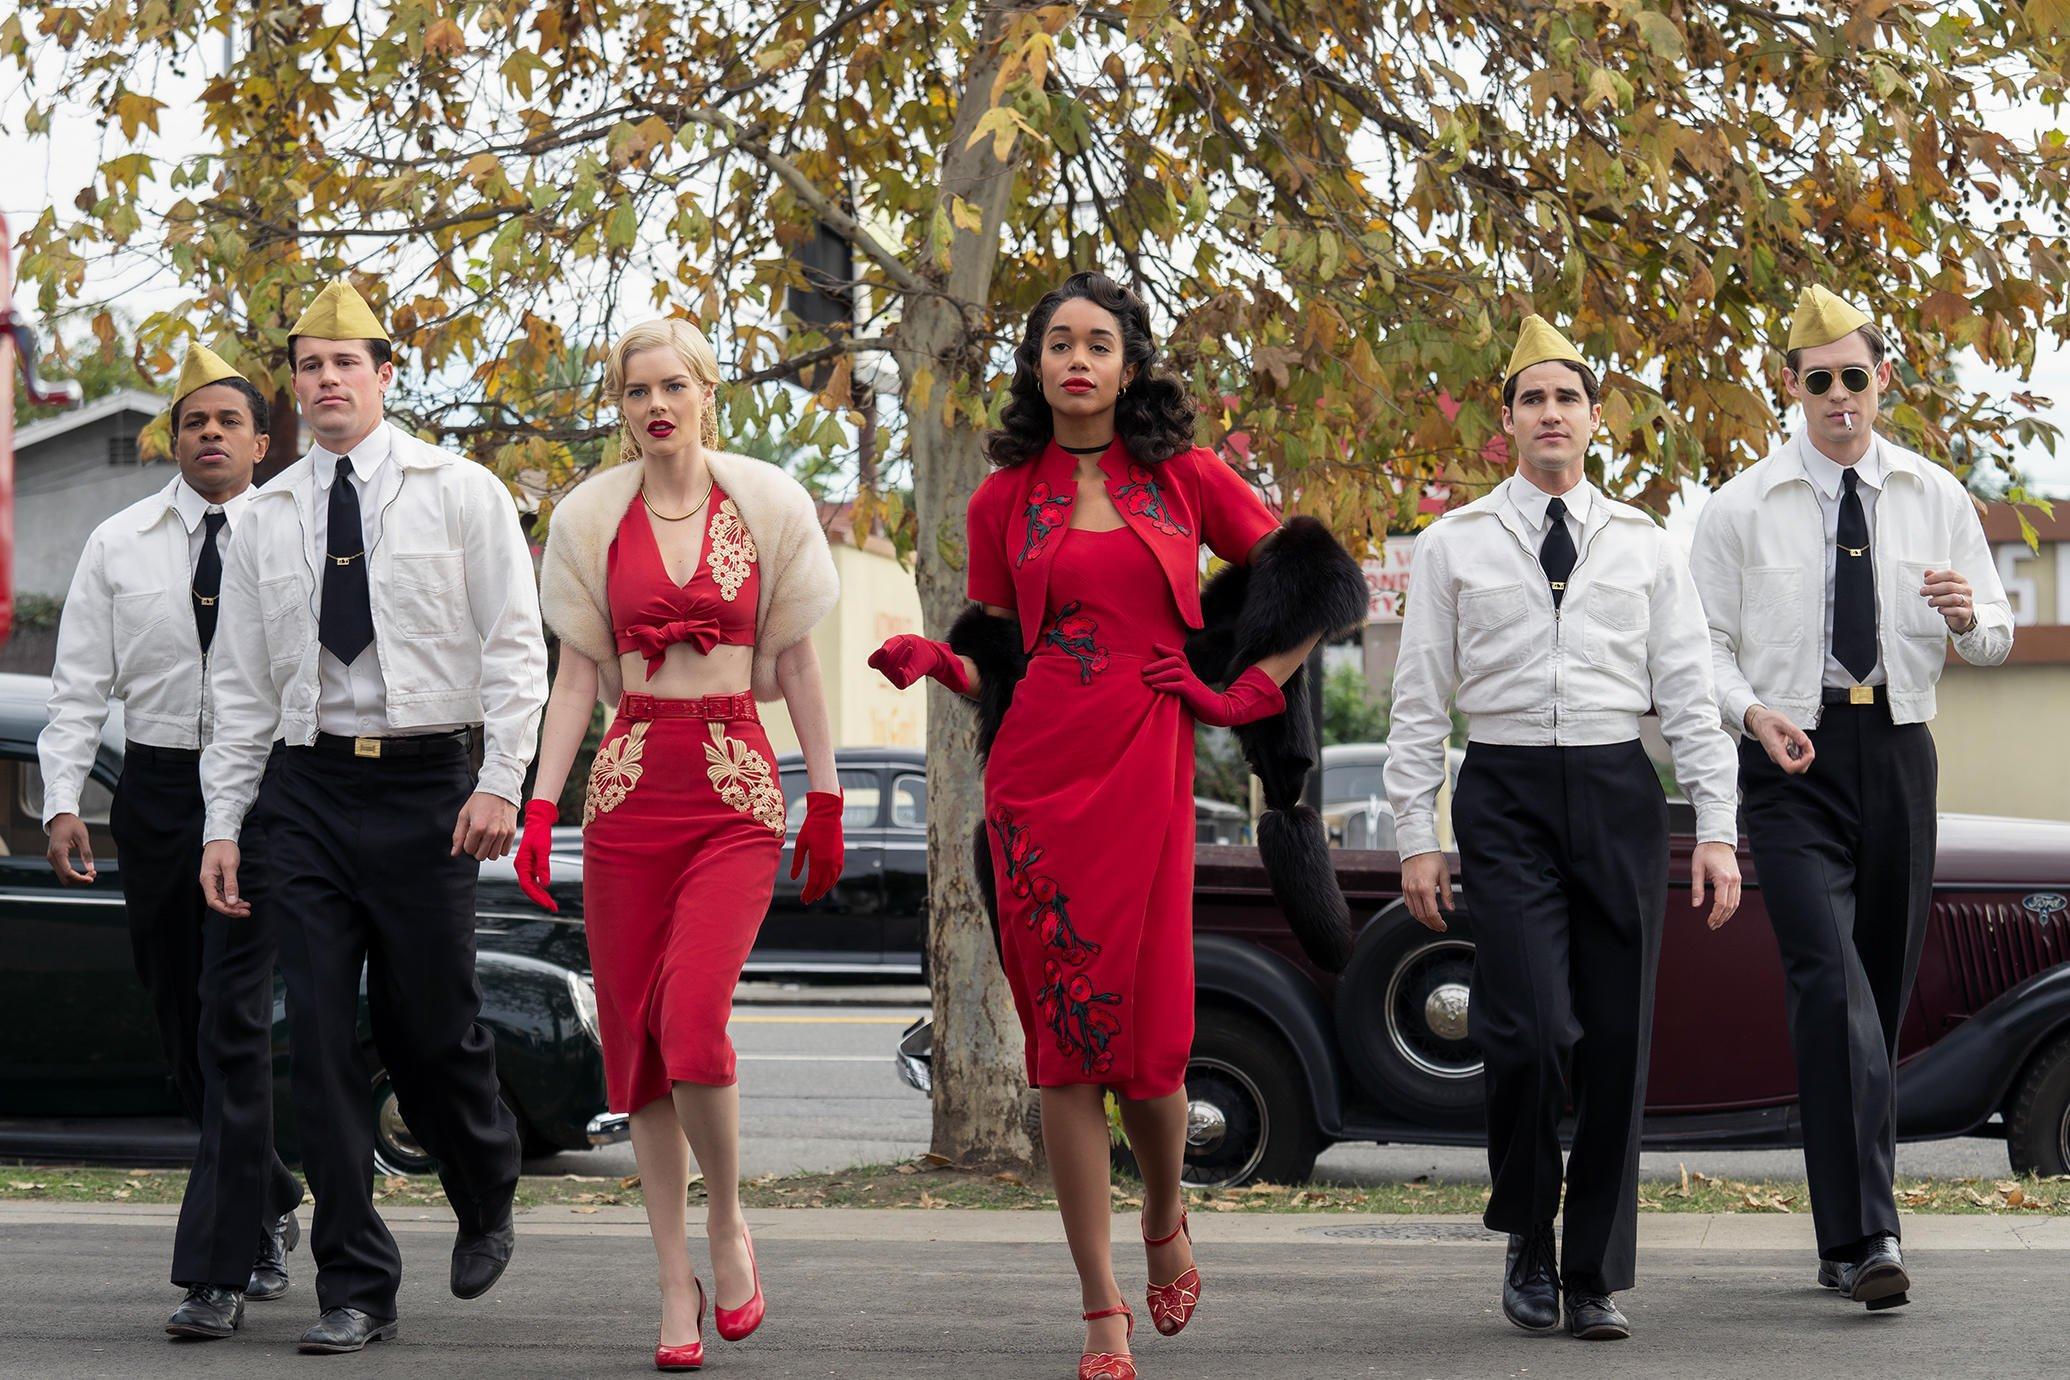 Jeremy Pope, Jake Picking, Samara Weaving, Laura Harrier, Darren Criss and David Corenswet in HOLLYWOOD